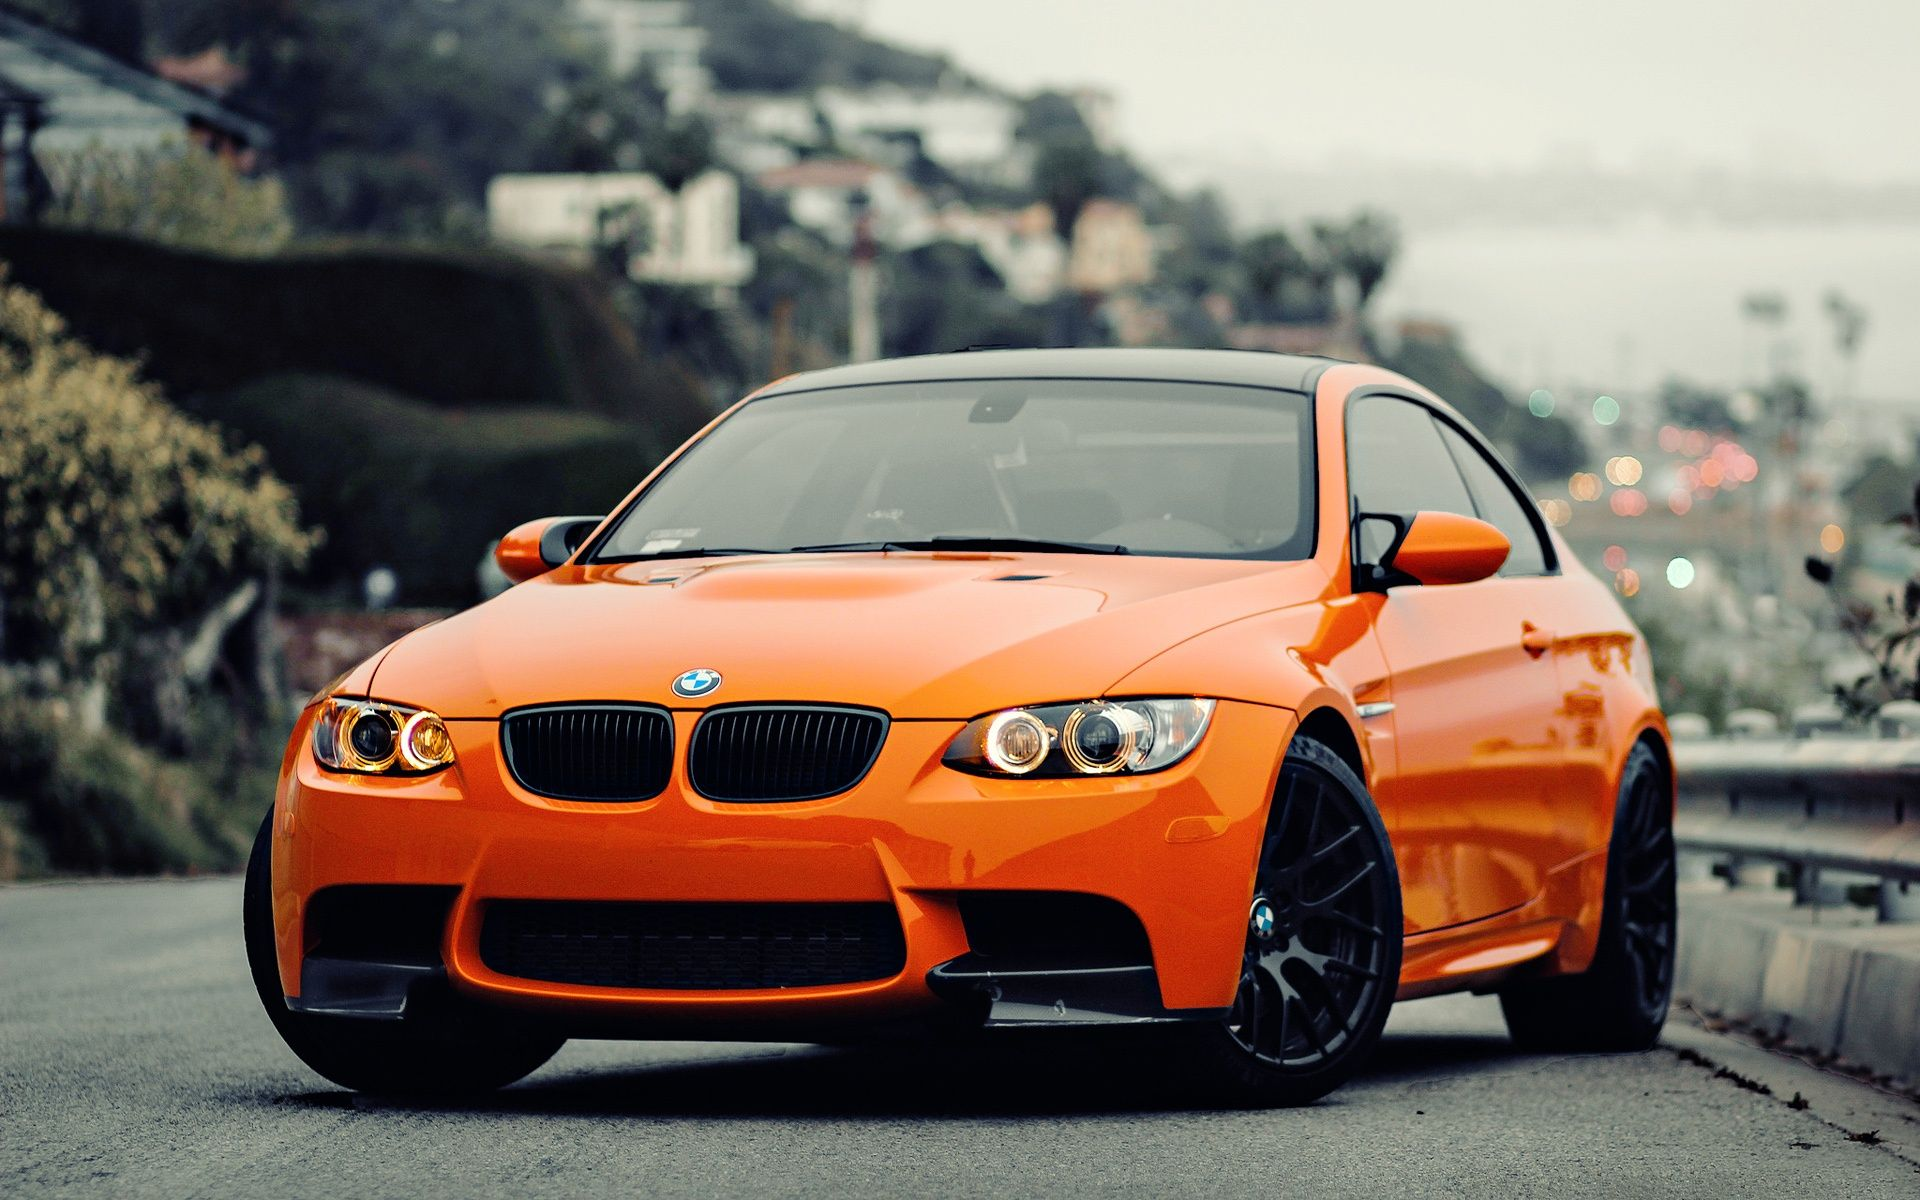 Beautiful Orange Car